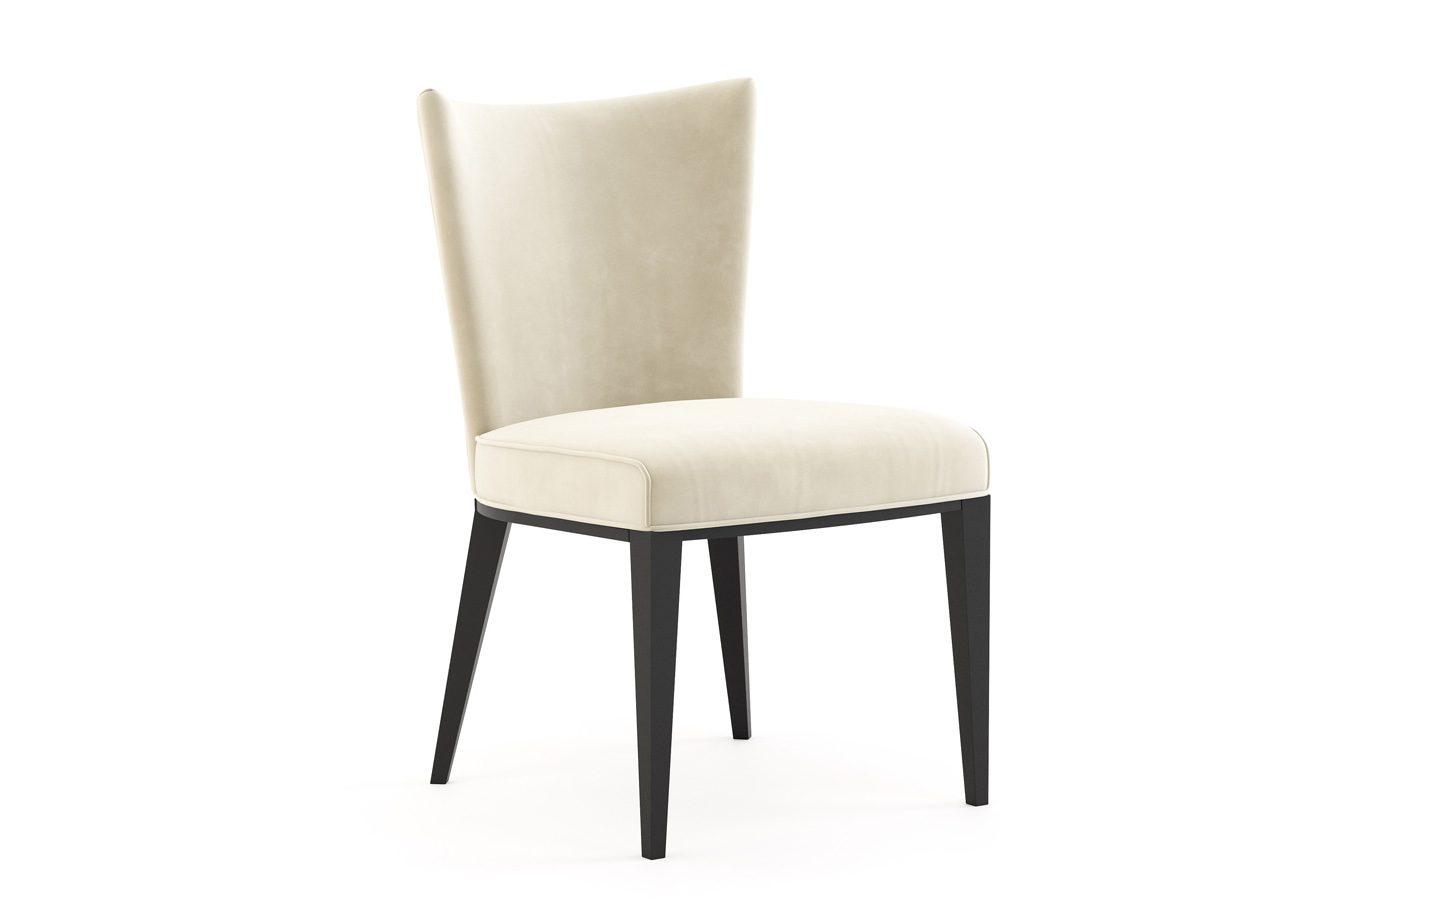 Cicada-Side-Chair-by-fabiia-furniture-signature-1